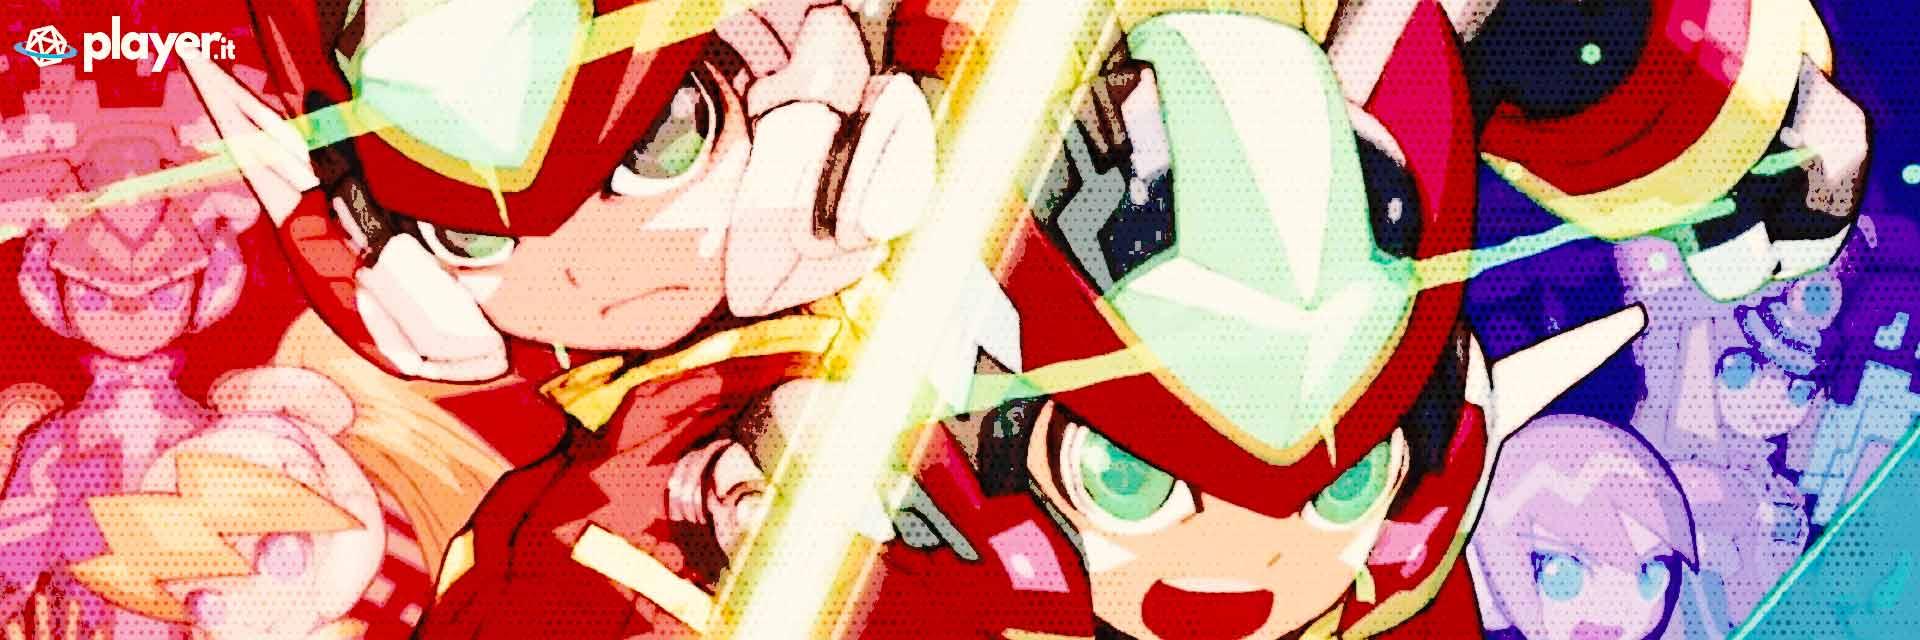 Mega Man Zero ZX Legacy Collection wallpaper del gioco